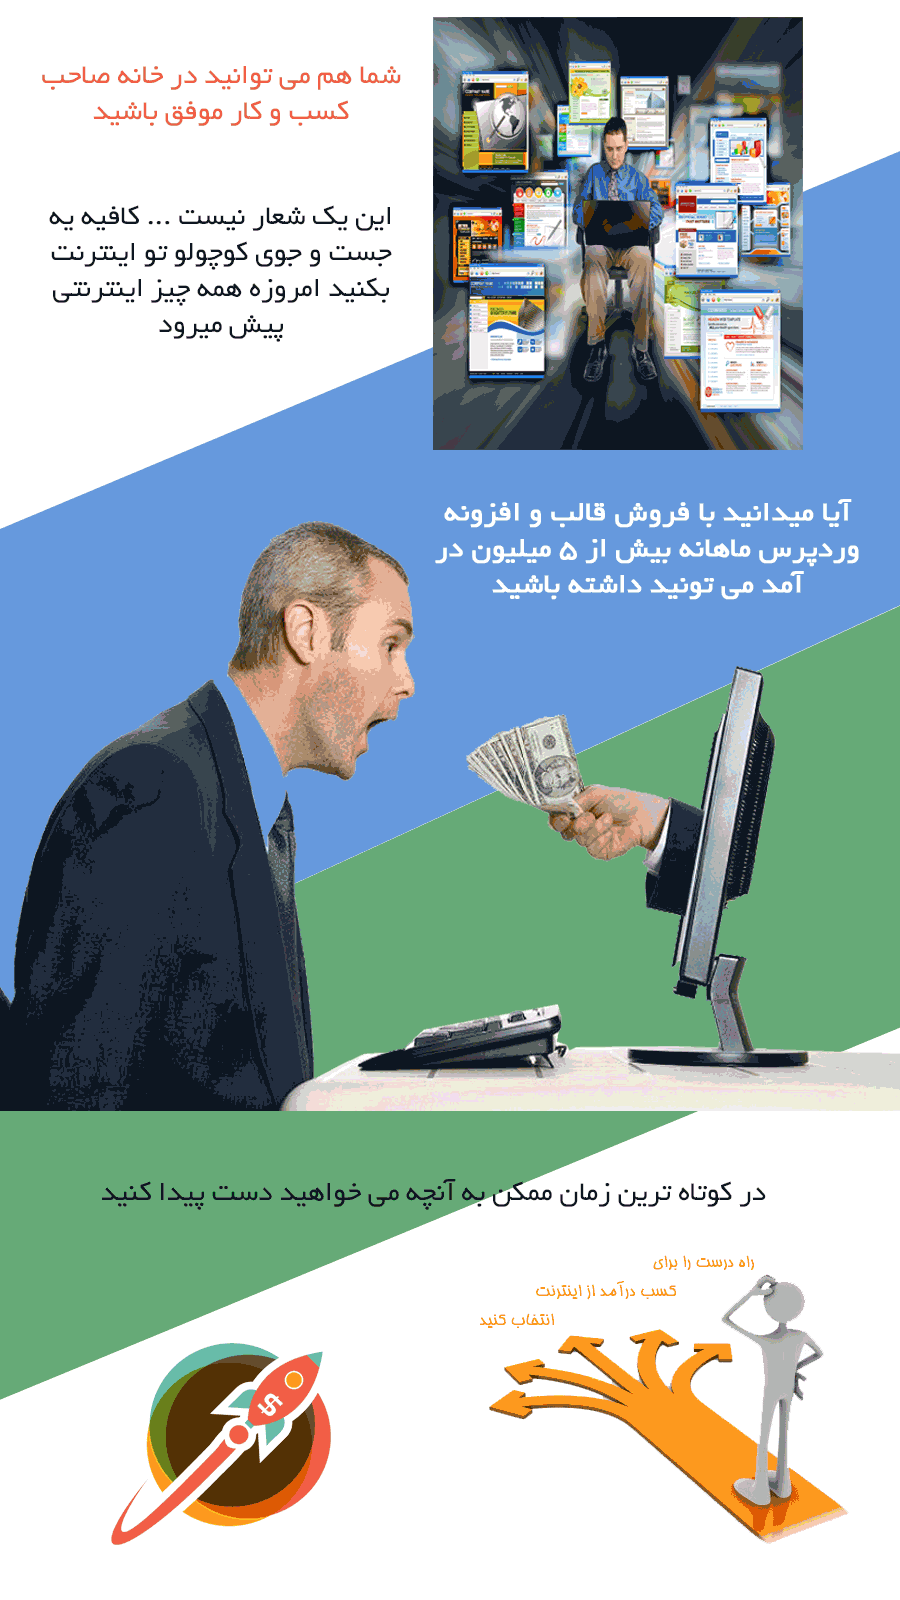 پکیج عیدانه کسب و کار پادرانت